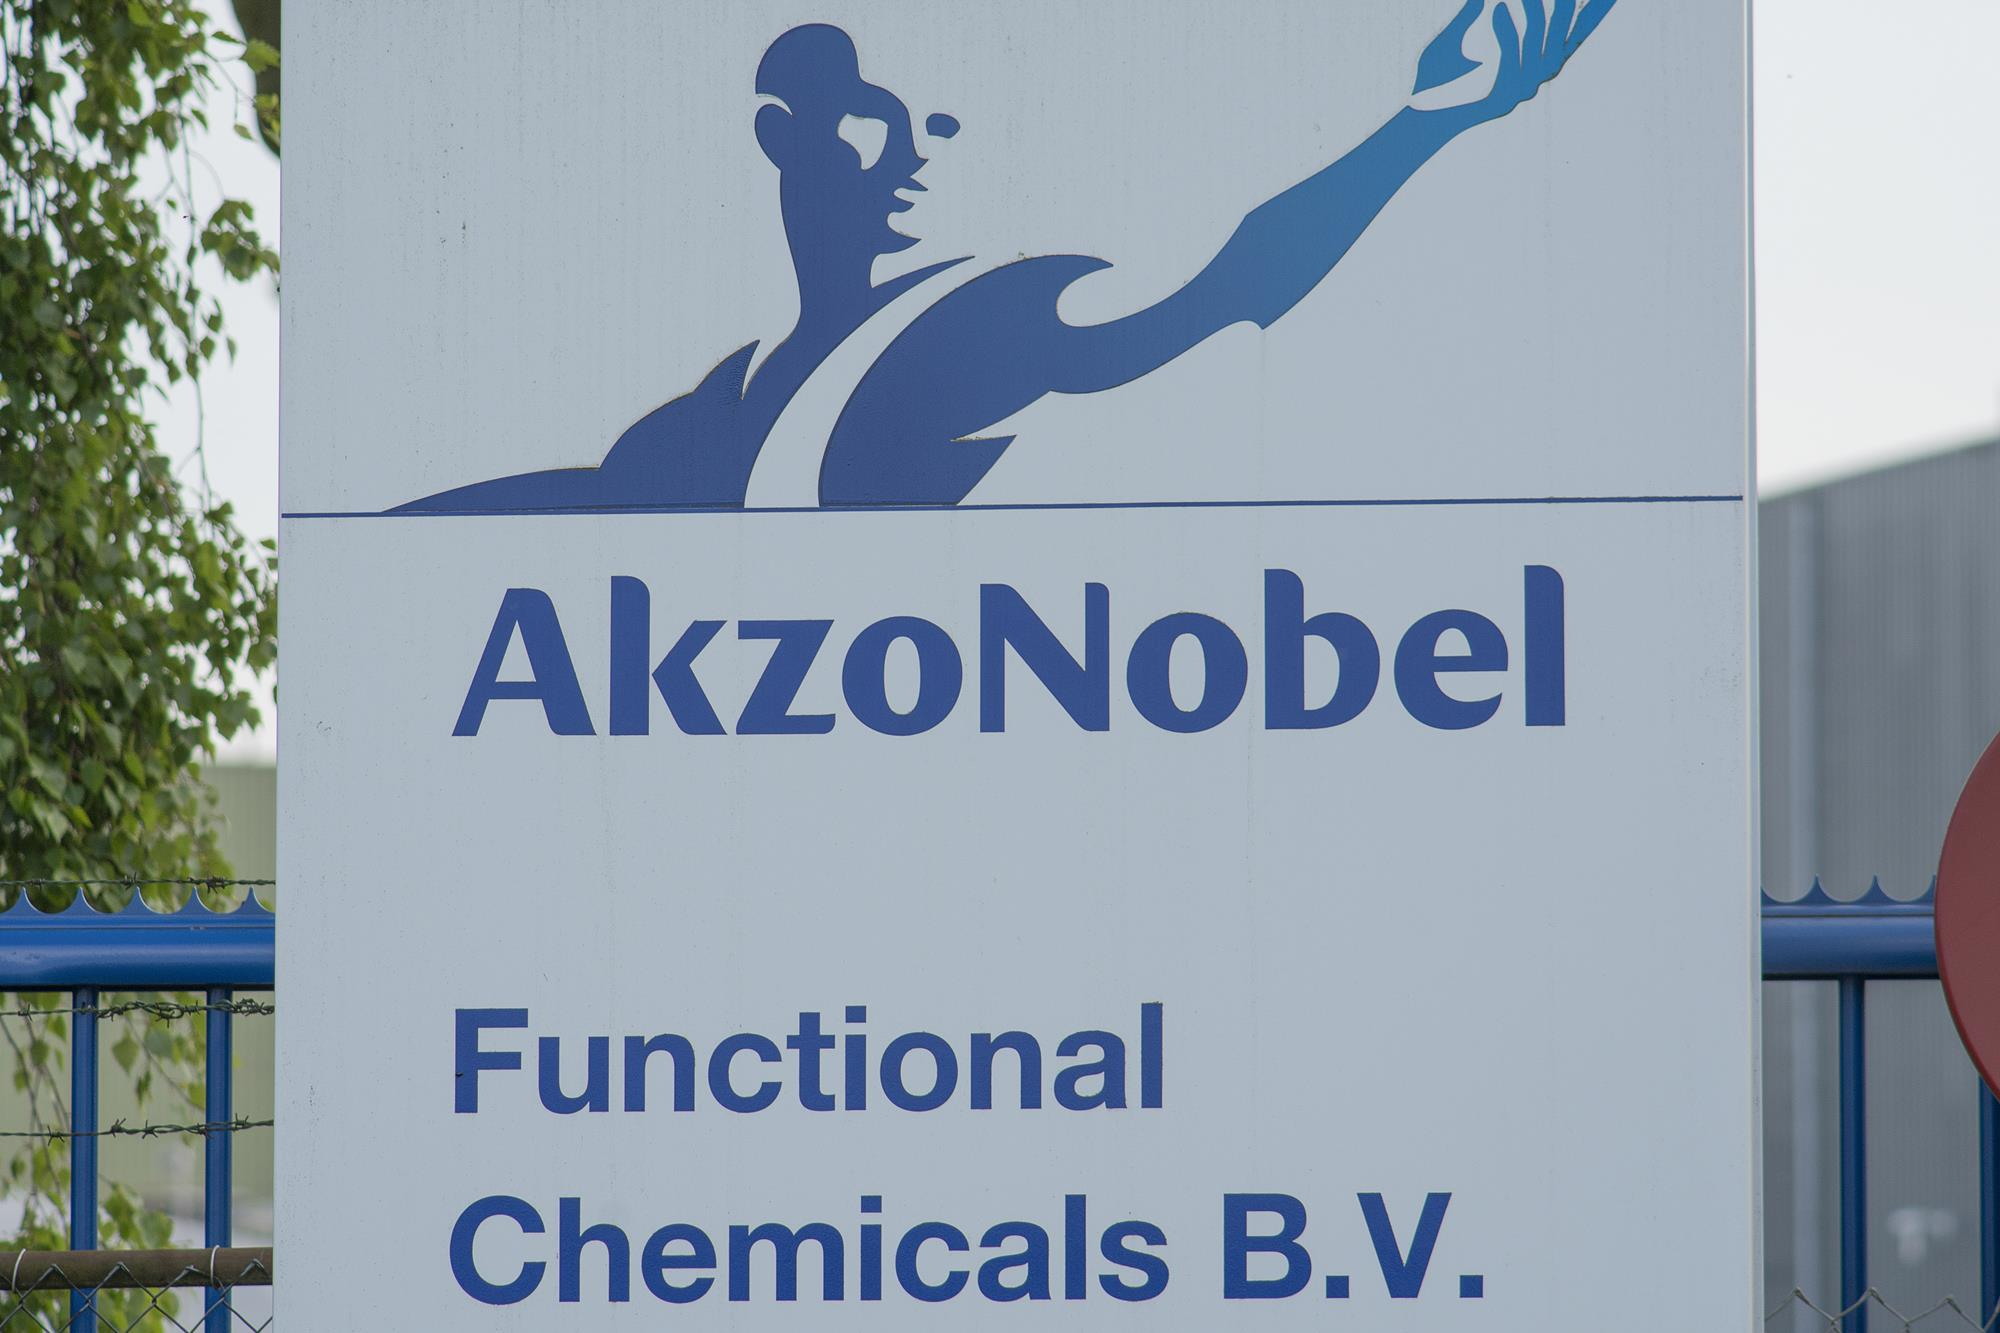 Panattoni lands AkzoNobel site ahead of housebuilders | News